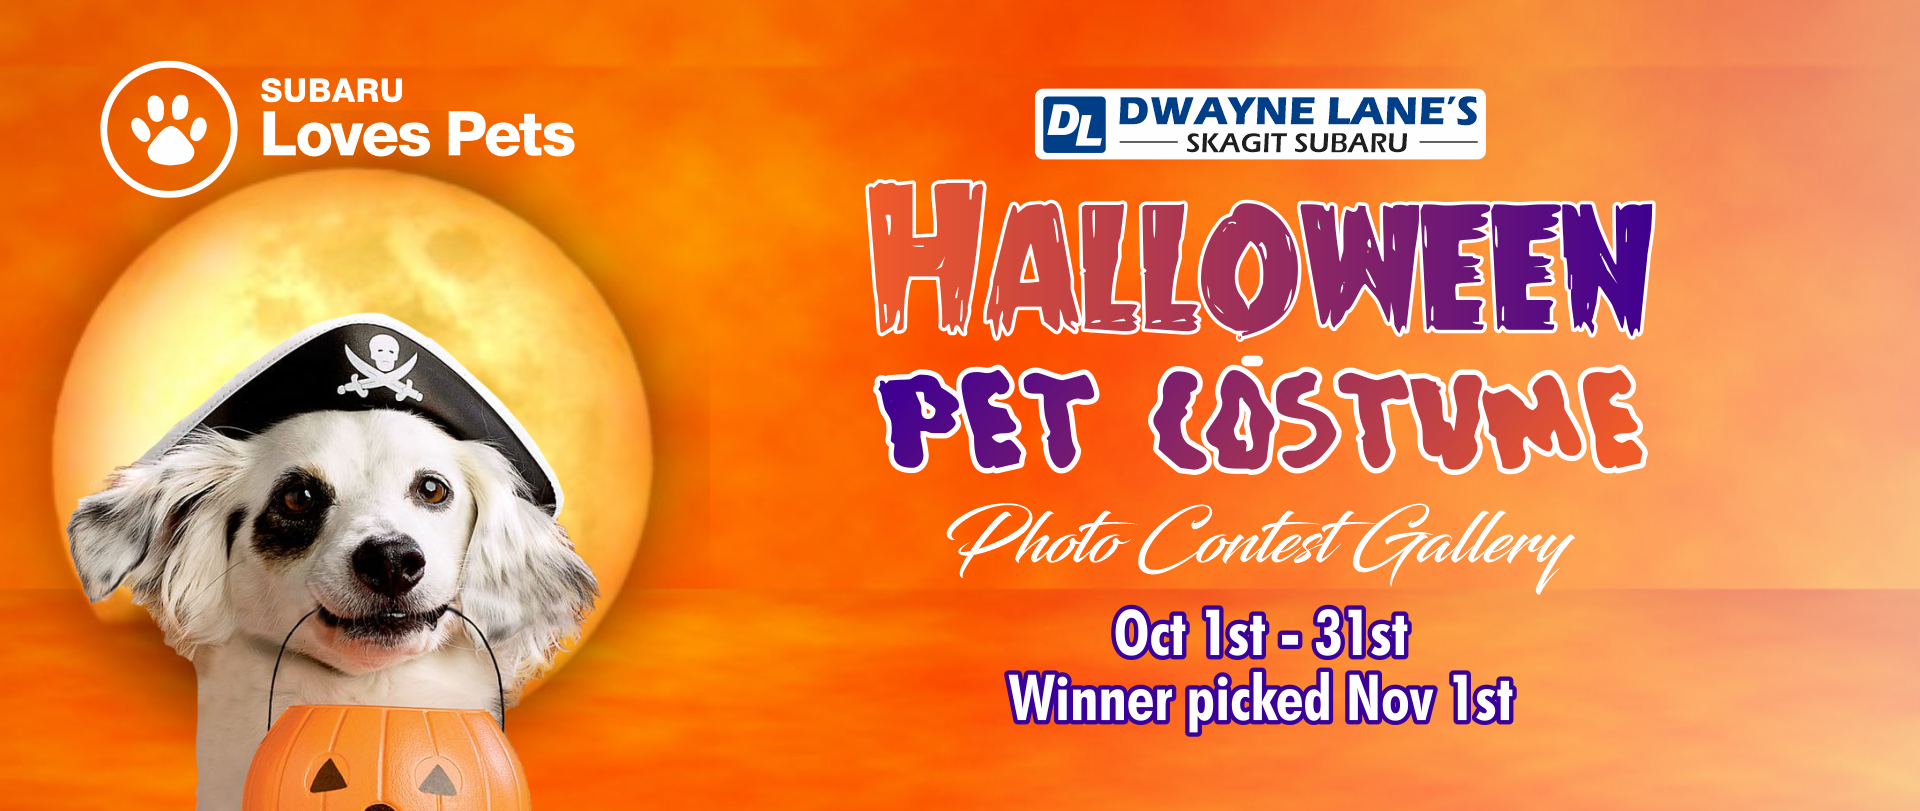 HalloweenCostumeContest2021 Web Banner DLAF